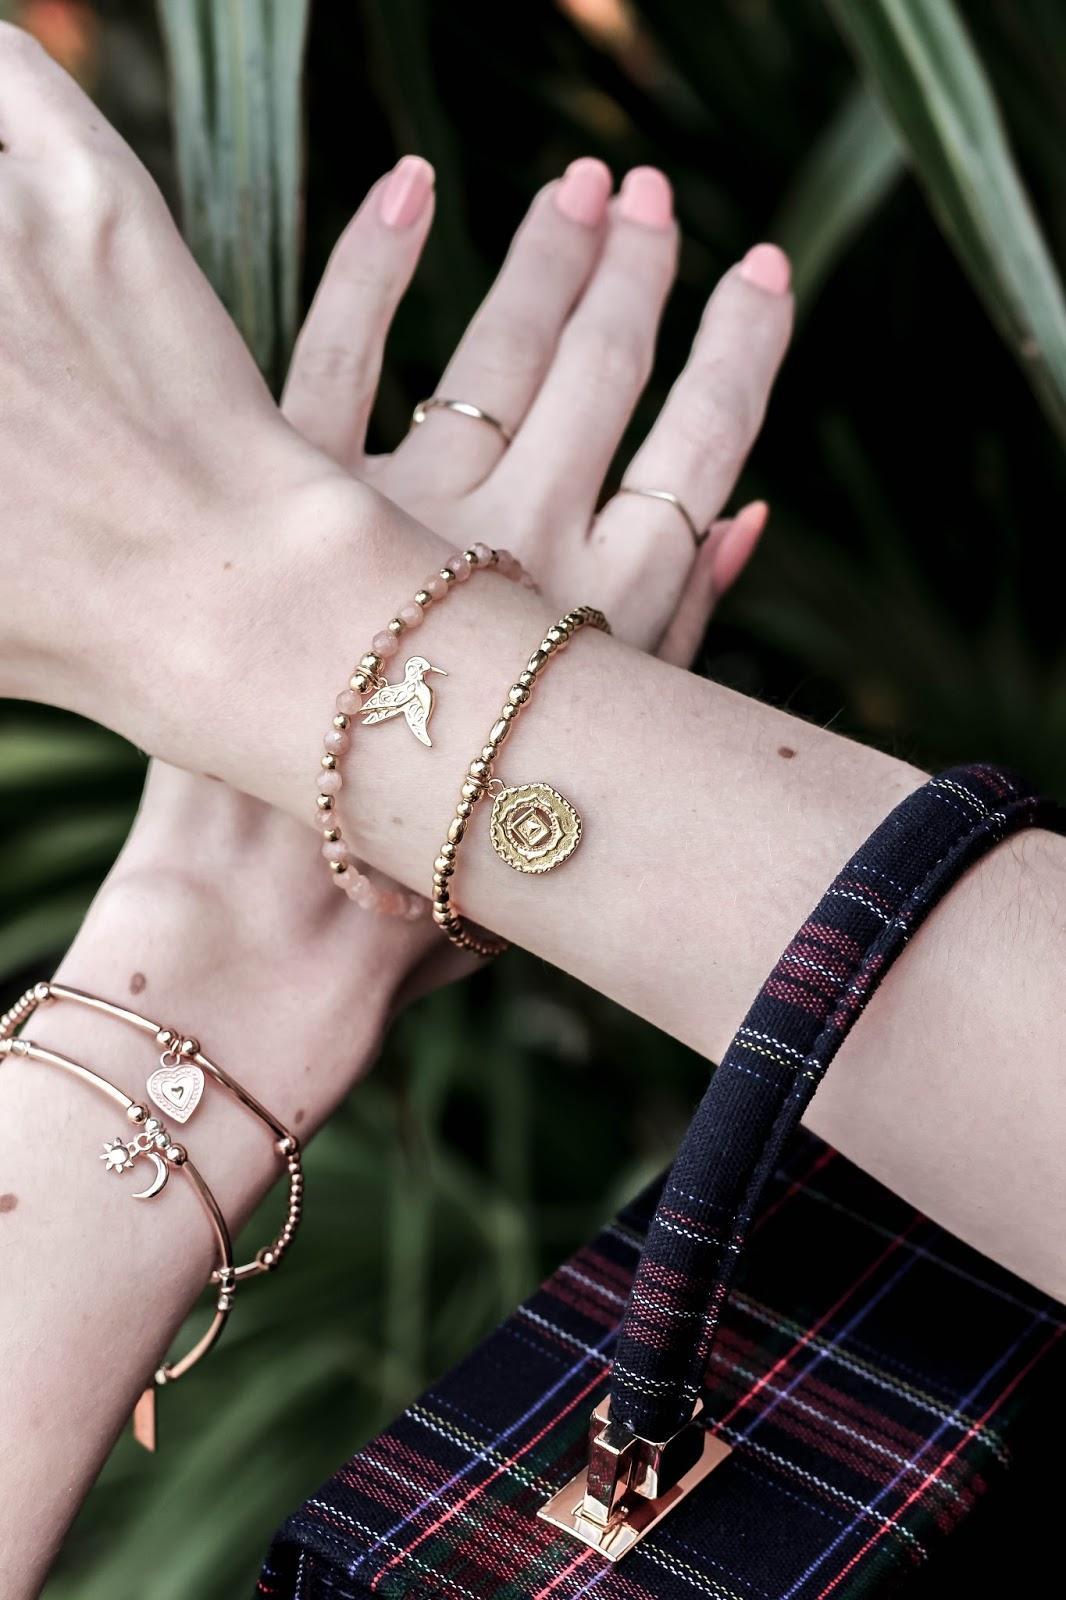 Chlobo Cherabella Gold Bracelet Collection 2018